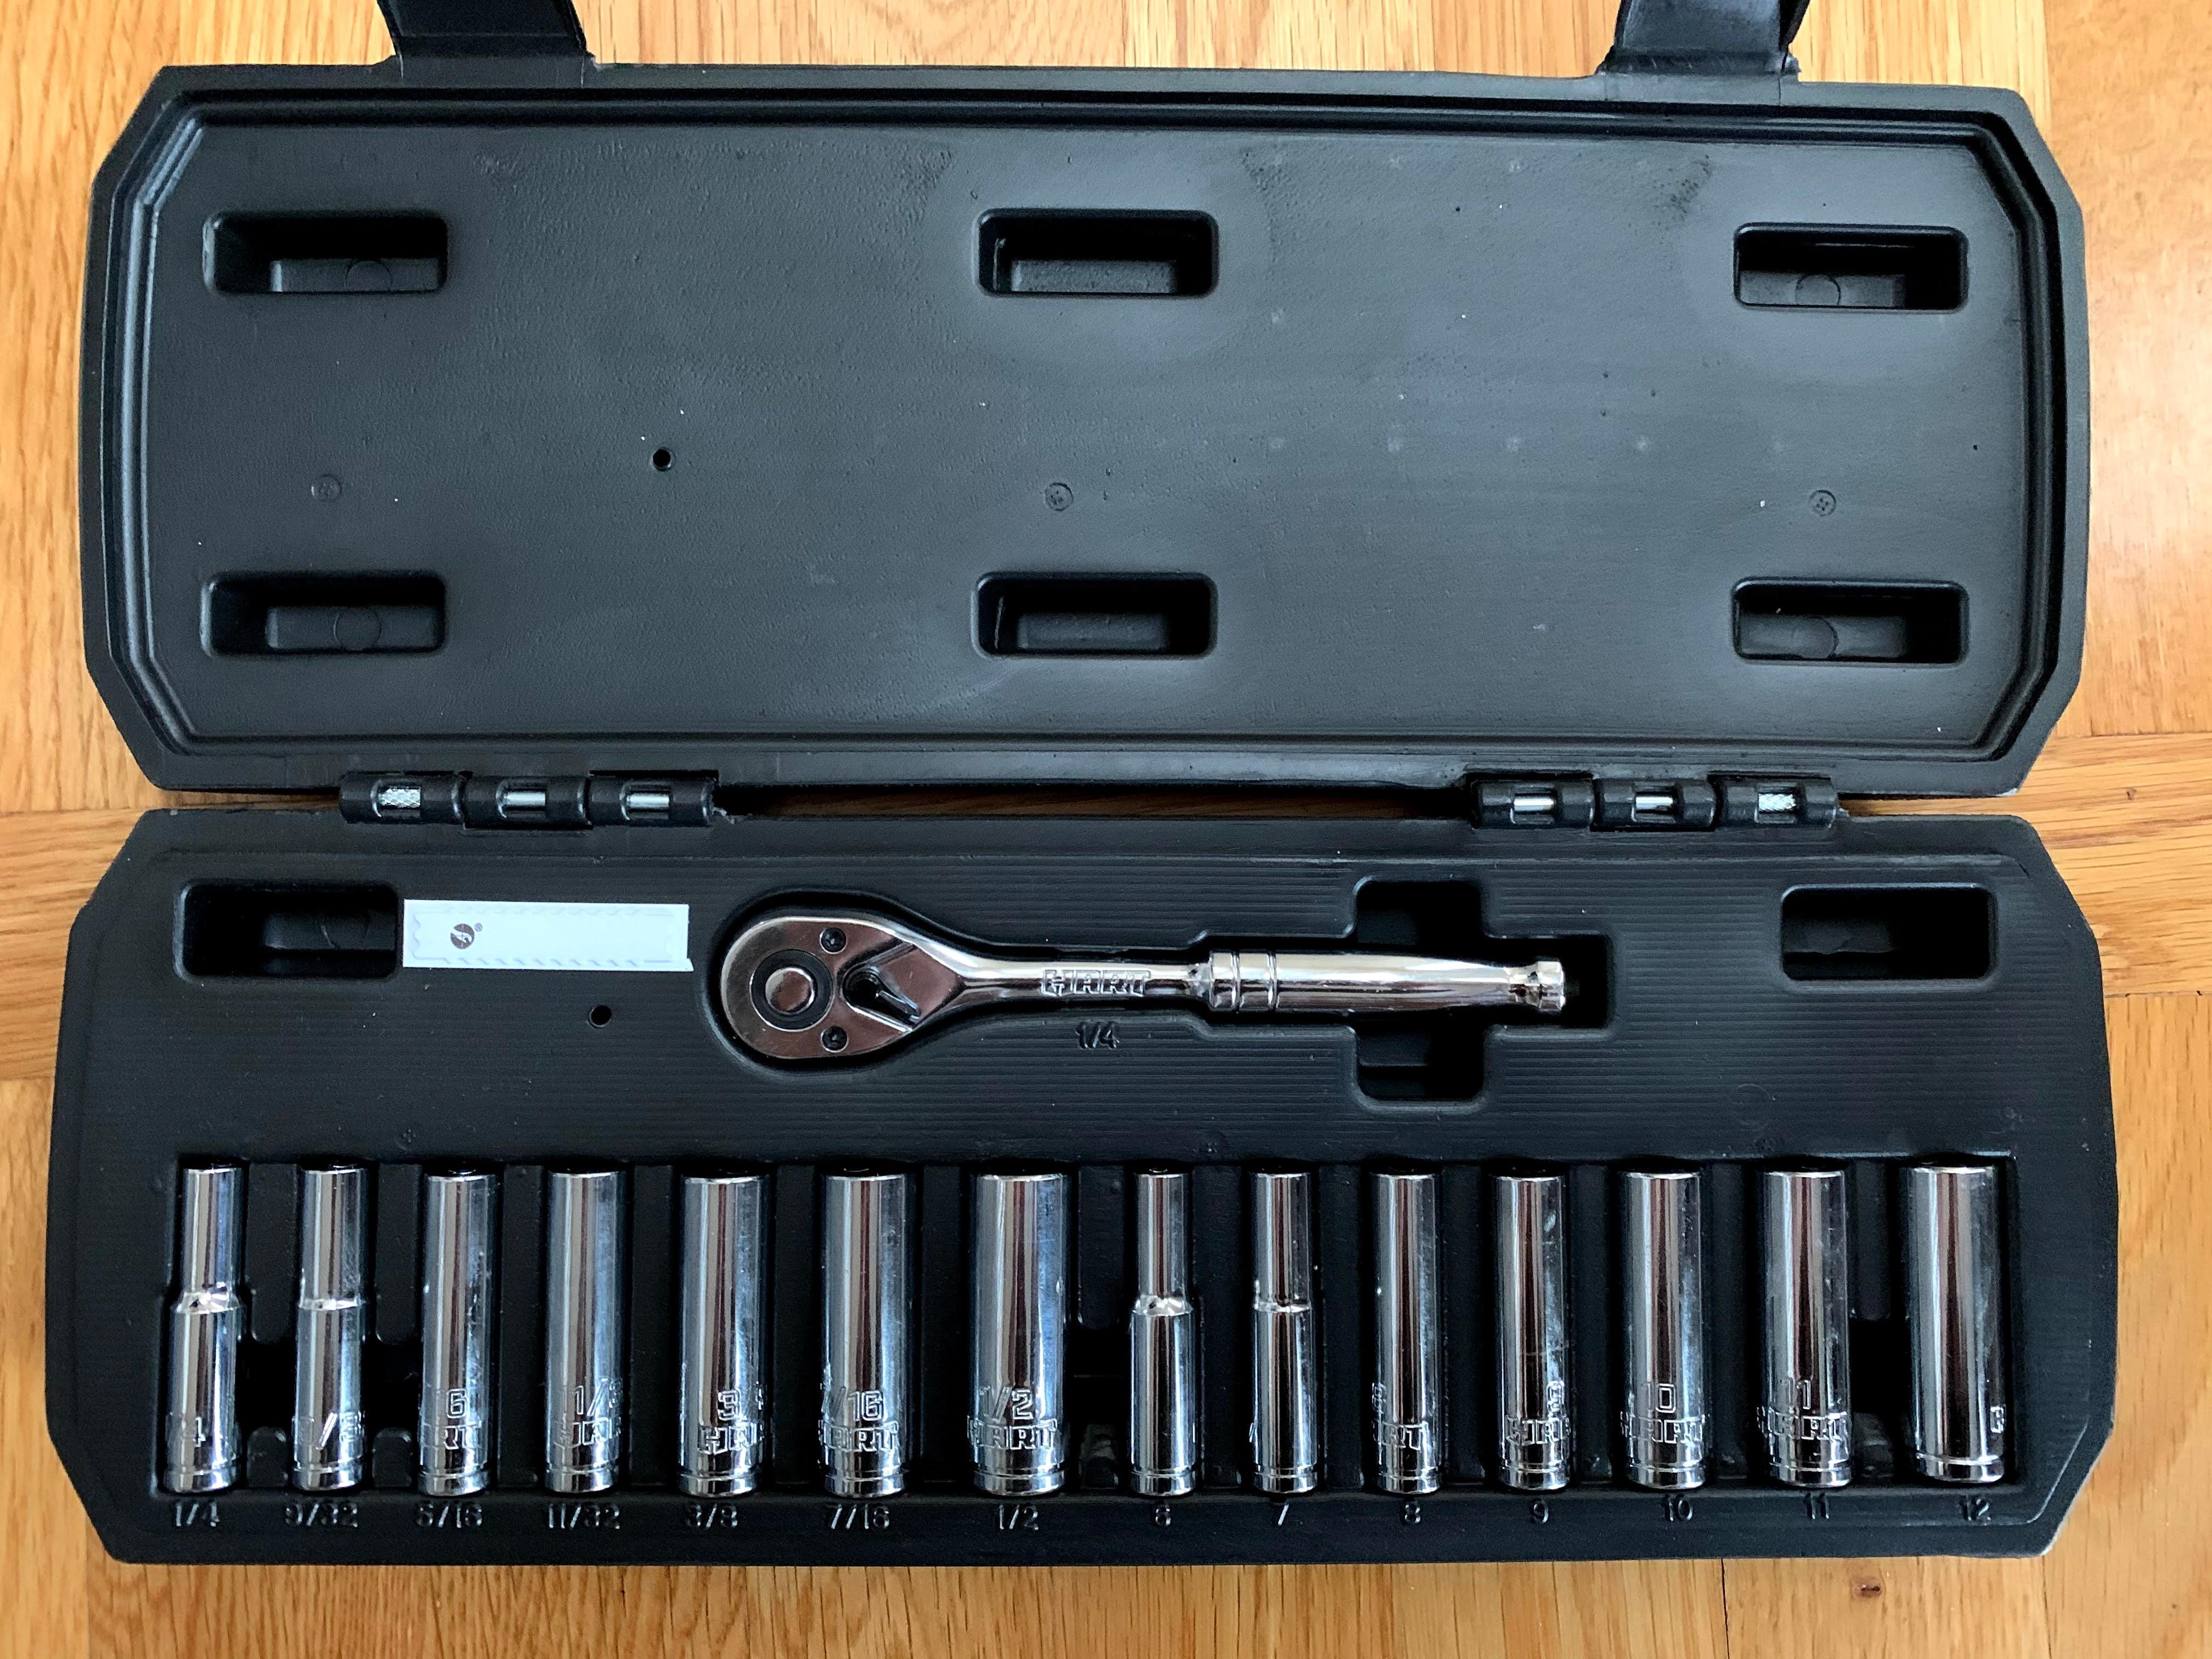 HART 15-Piece 1/4-inch Drive Deep Socket Set with Ratchet, Chrome - Walmart B&M local pickup $10